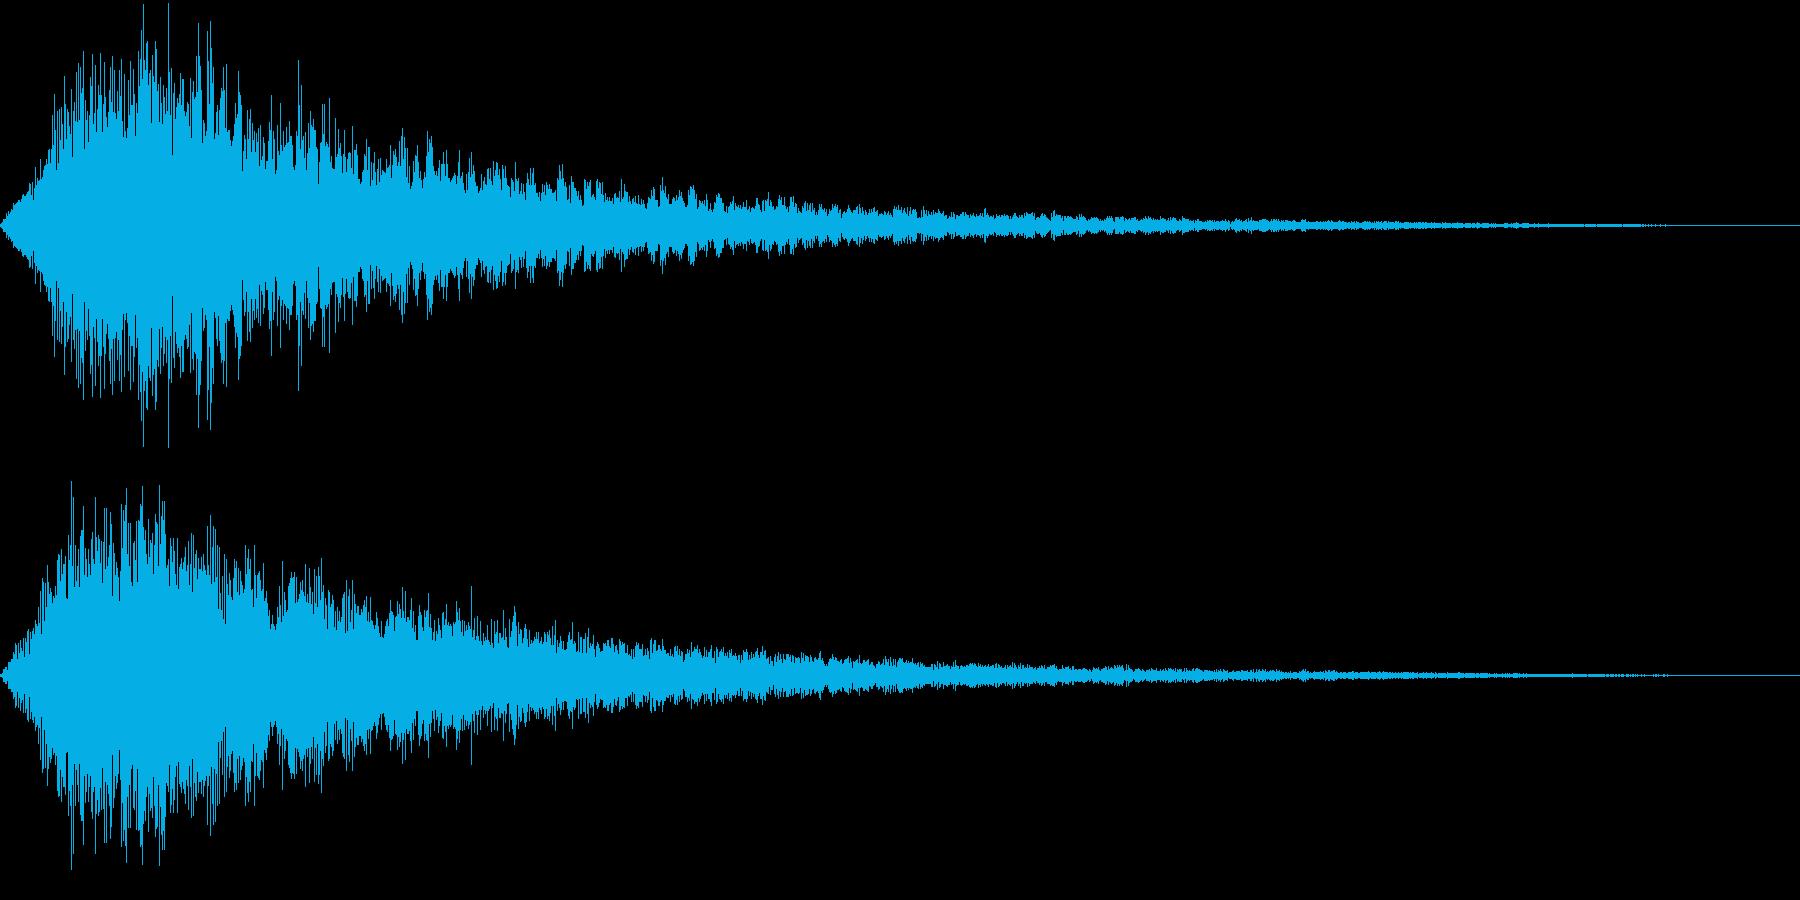 VOX ダーティーなコーラスPAD 1の再生済みの波形